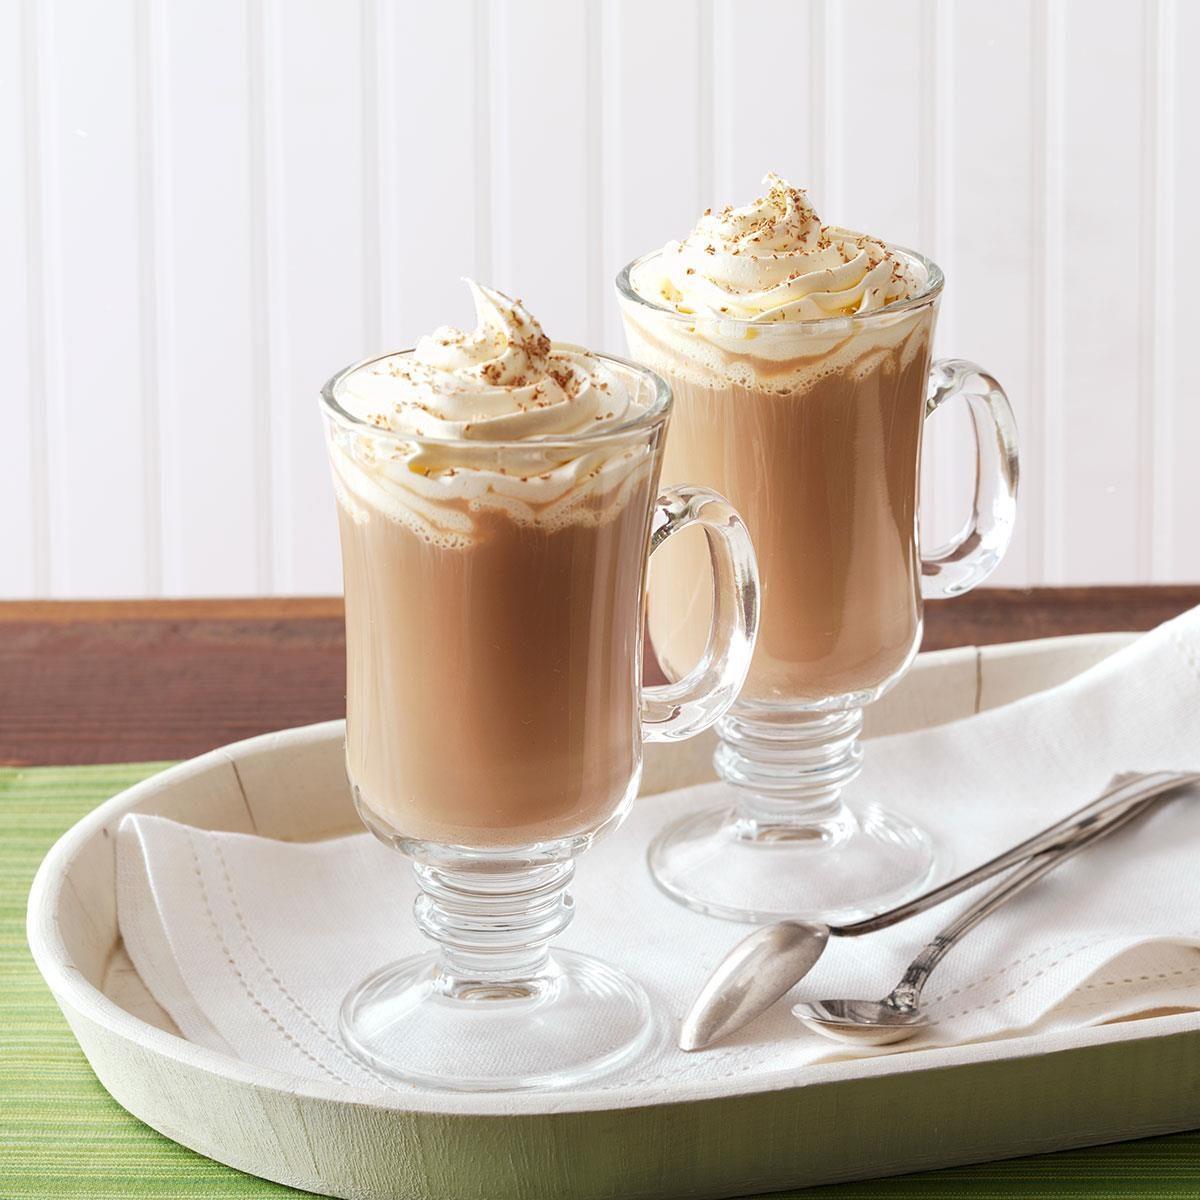 Creamy Irish Coffee